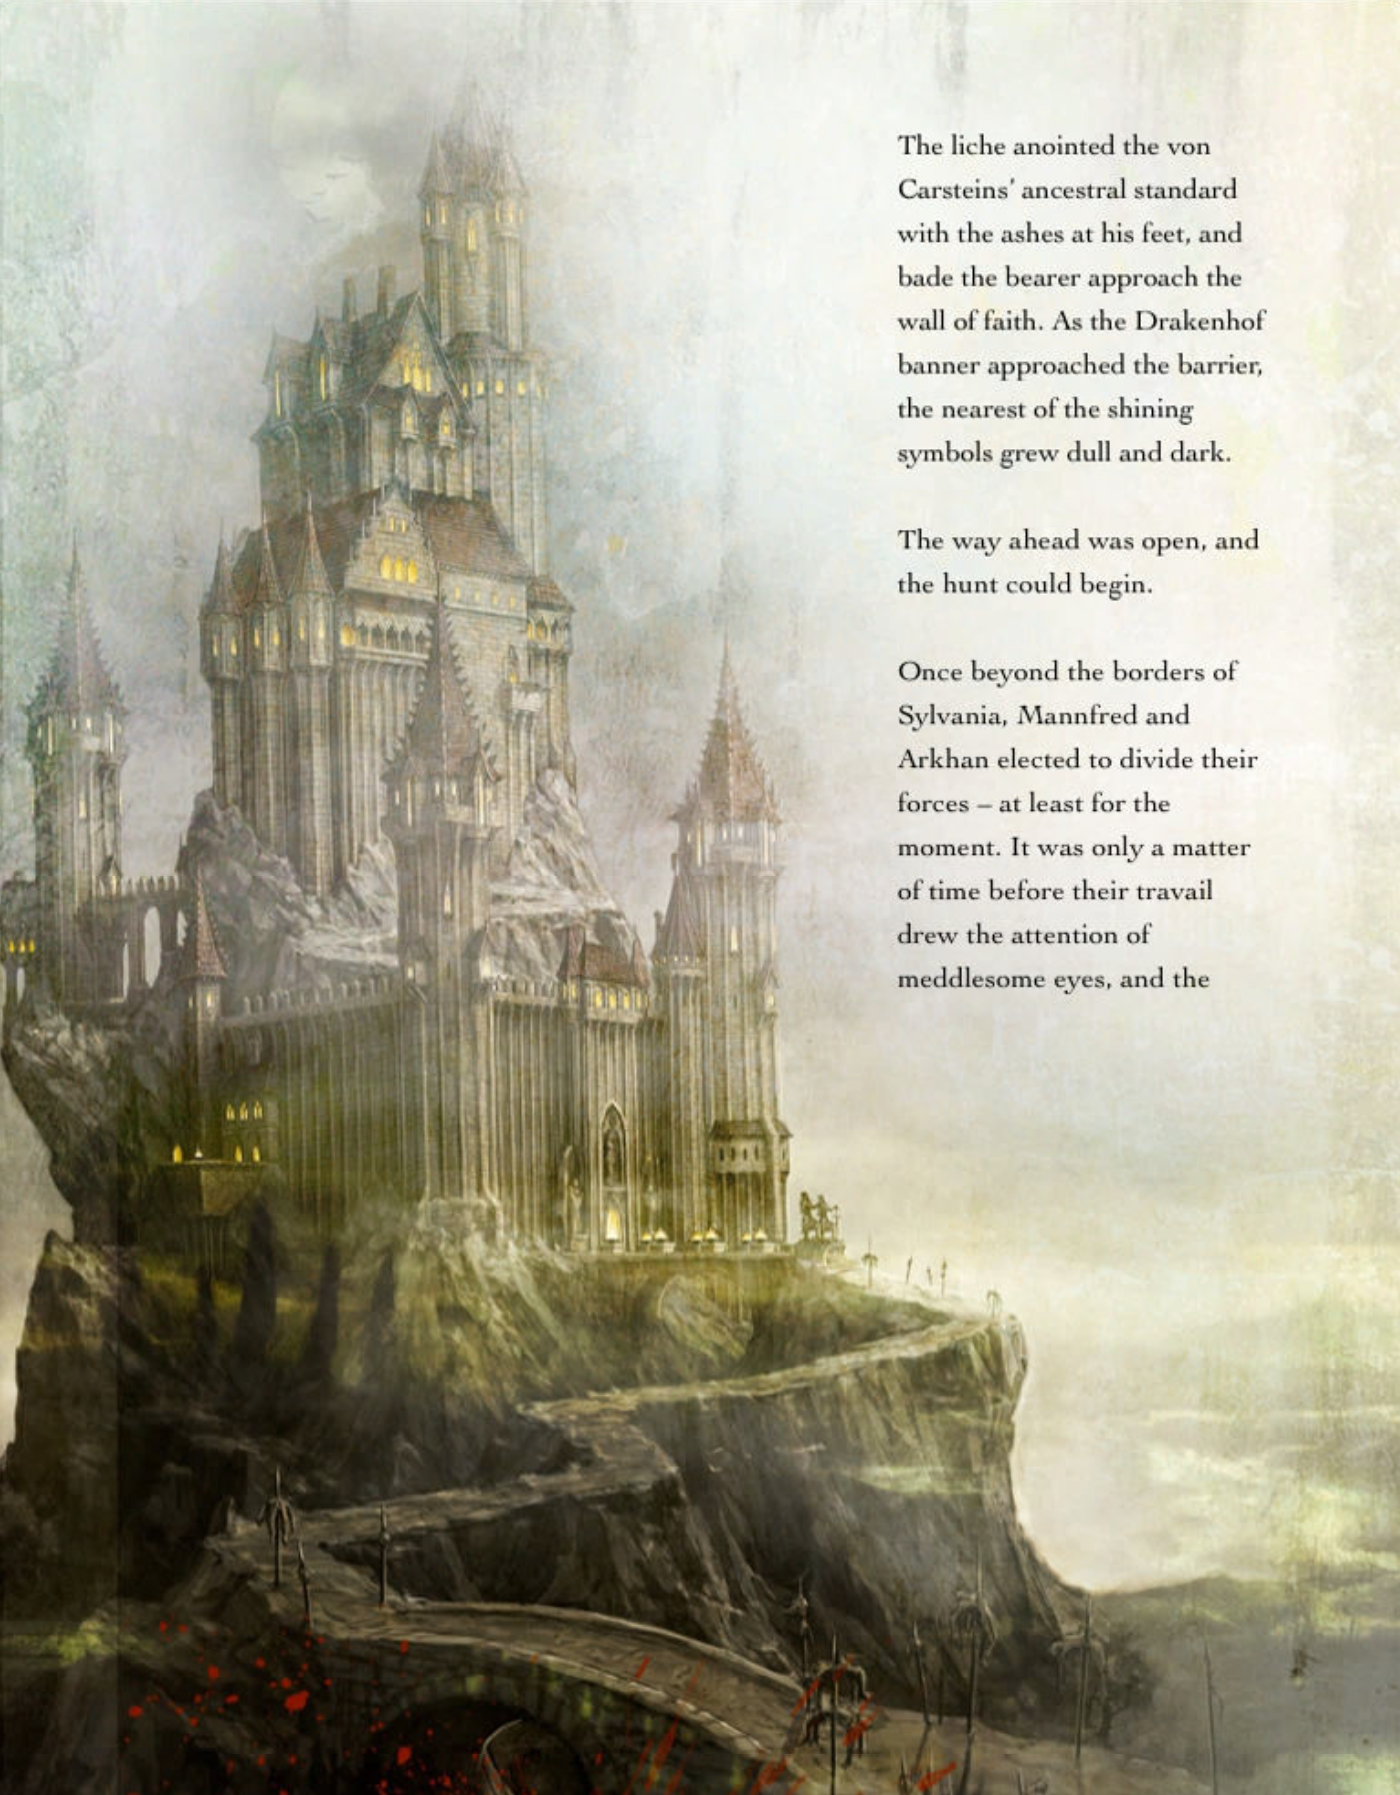 Drakenhof Castle Warhammer Wiki Fandom Powered By Wikia